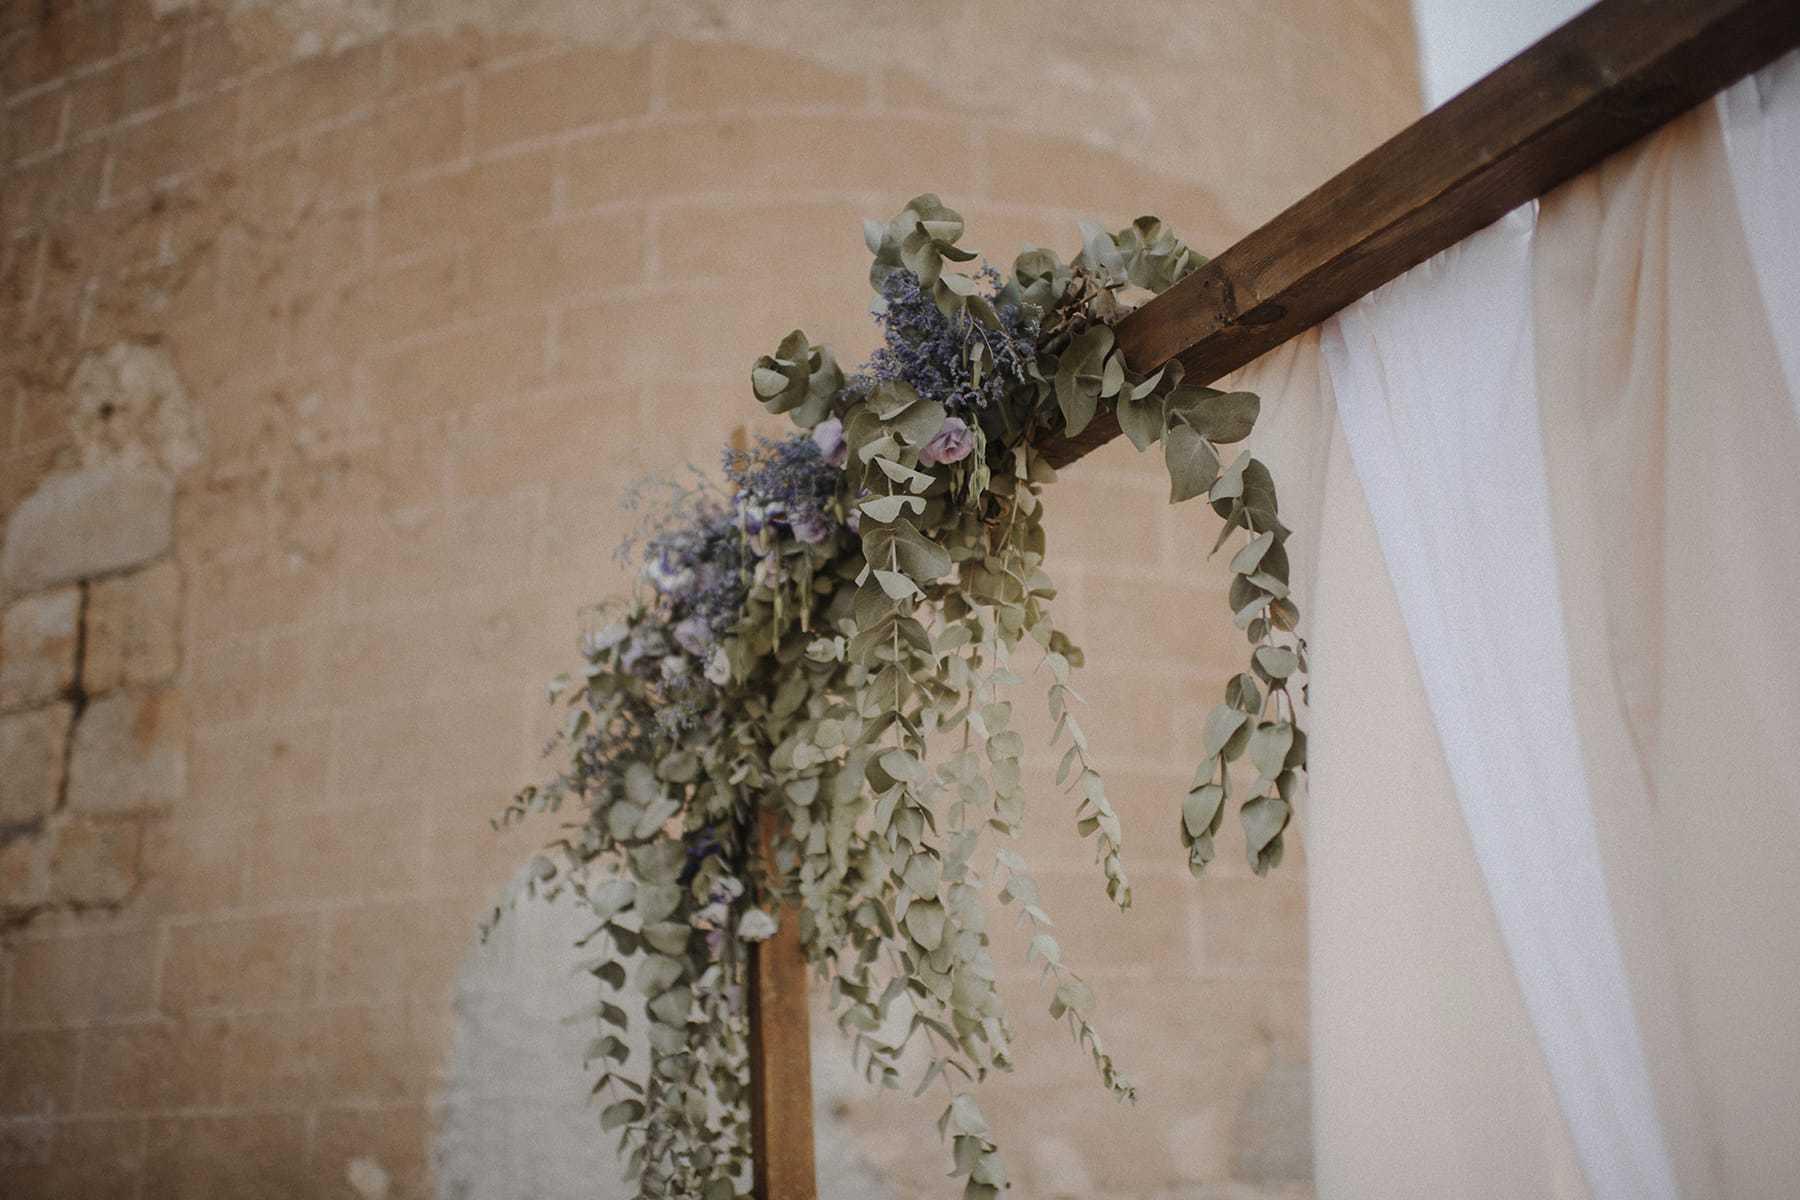 Detalle floral en un arco de la ceremonia civil